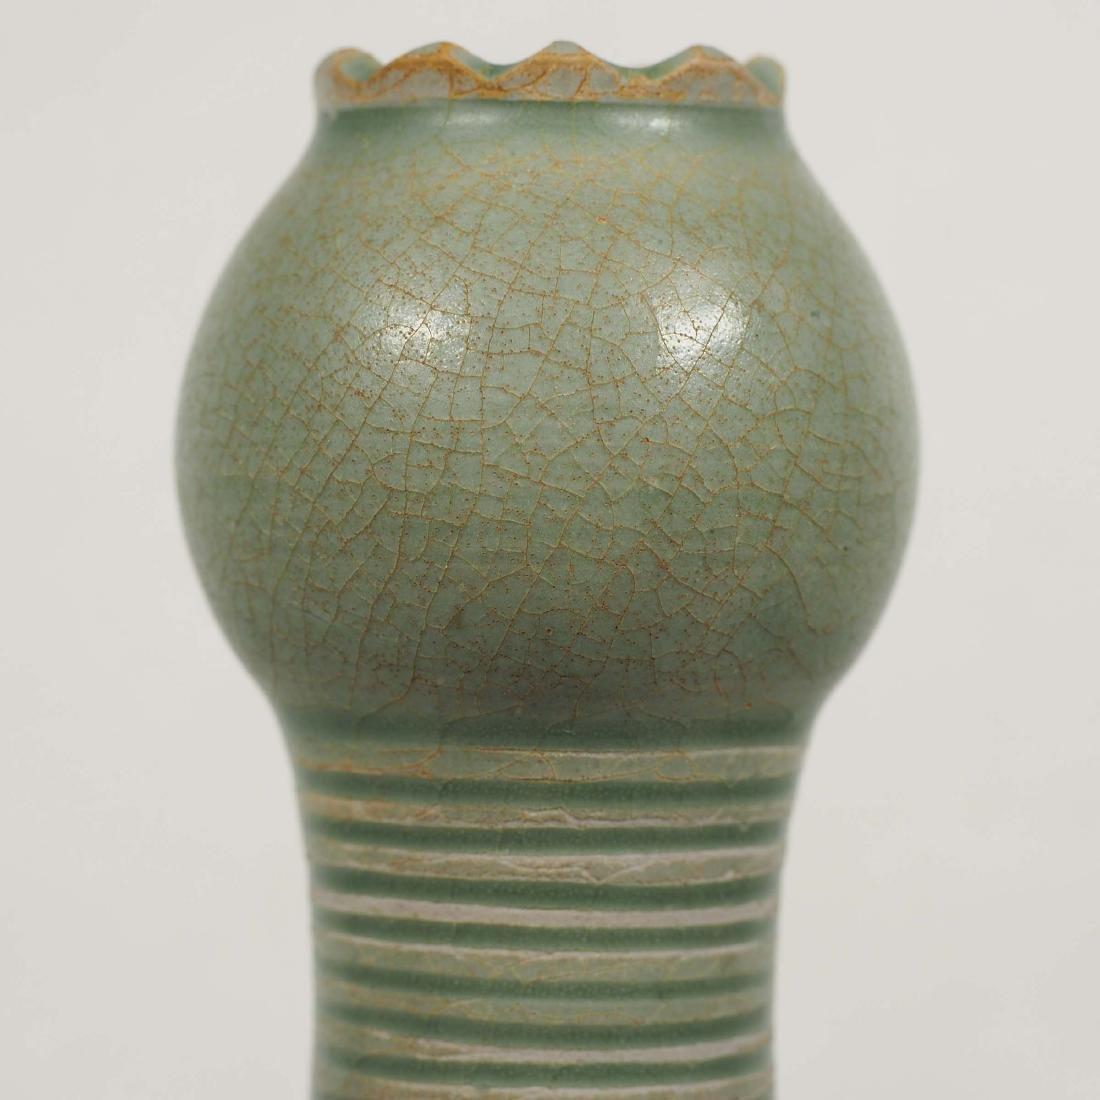 Yaozhou Garlic-Head Vase, Five Dynasty - 5